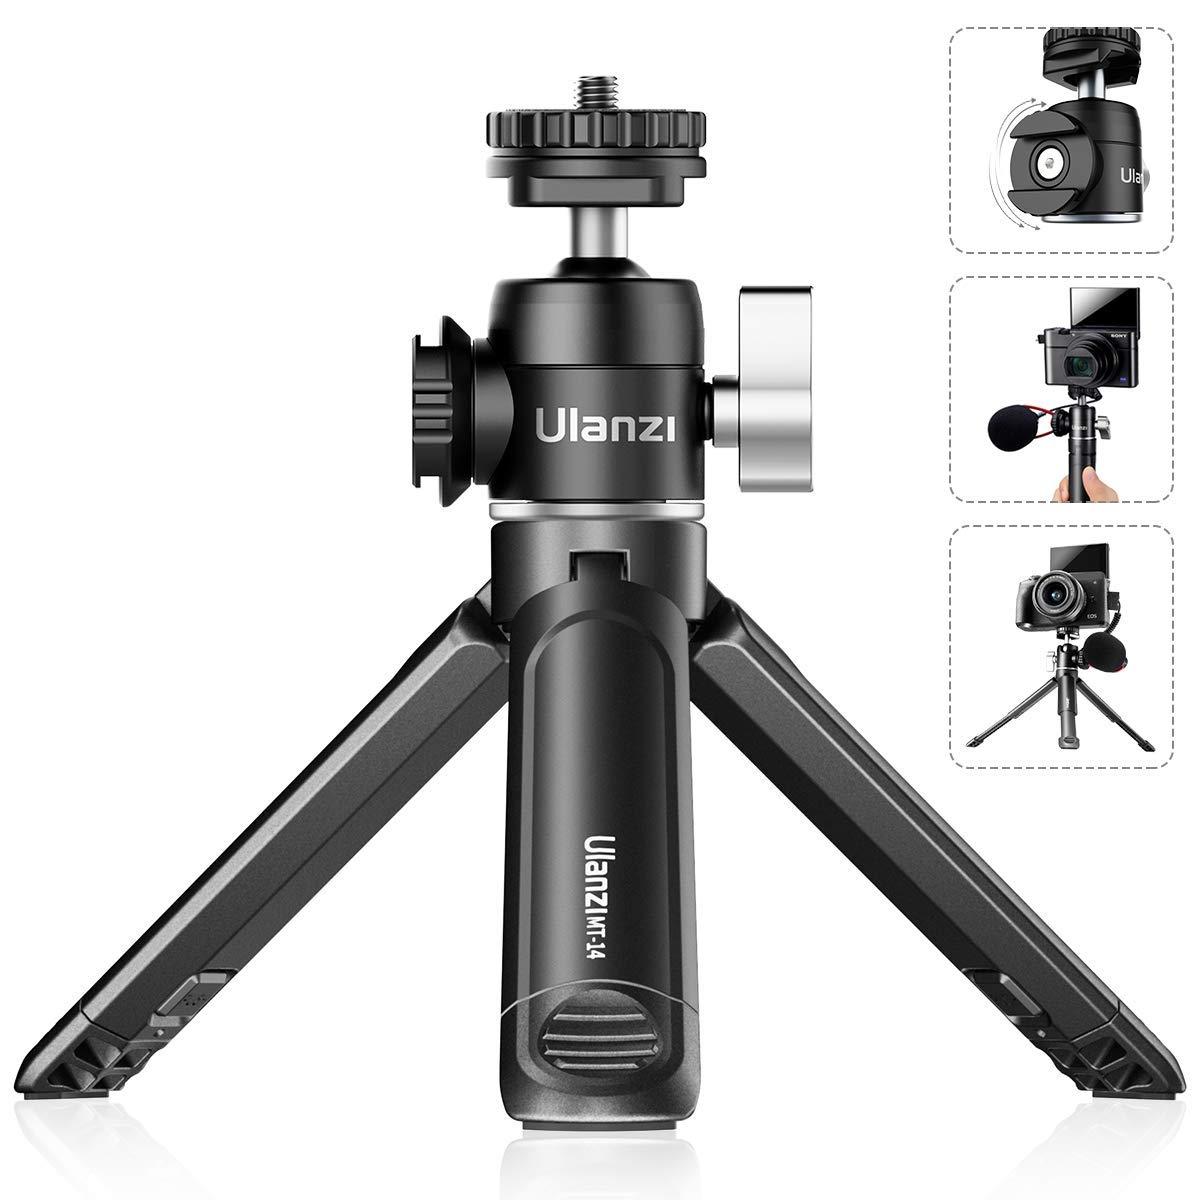 Mini Tripod, ULANZI Mini Camera Tripod with 360° Ball Head & Cold Shoe, Extendable Small Selfie Stick Tabletop Tripod…